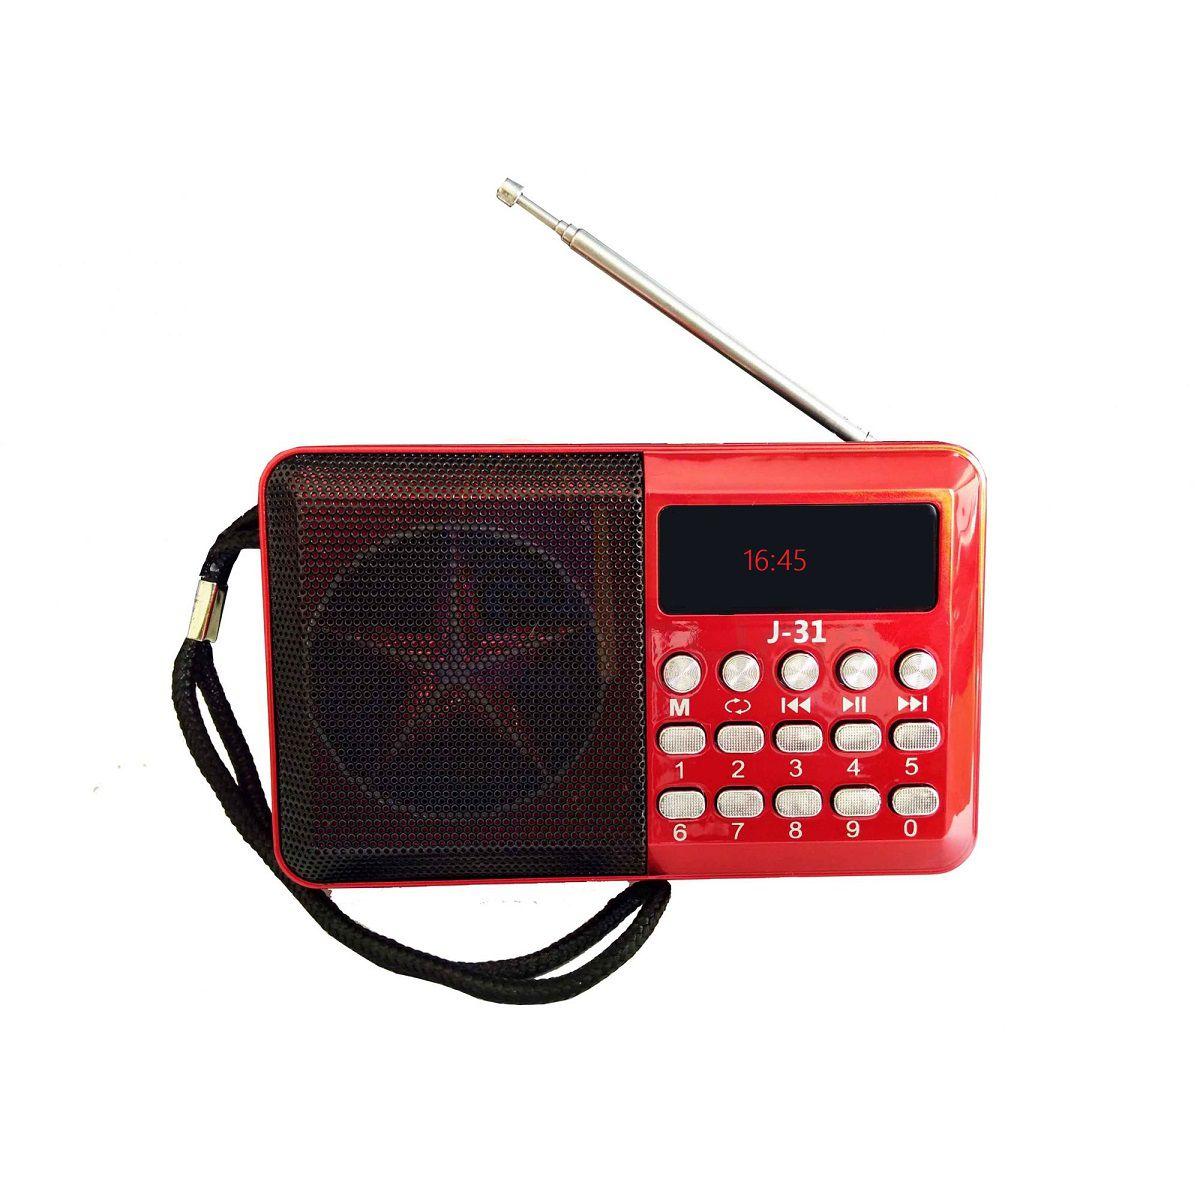 Rádio Digital De Bolso Portátil FM TF USB Hora Recarregável J-31 Altomex Vermelho